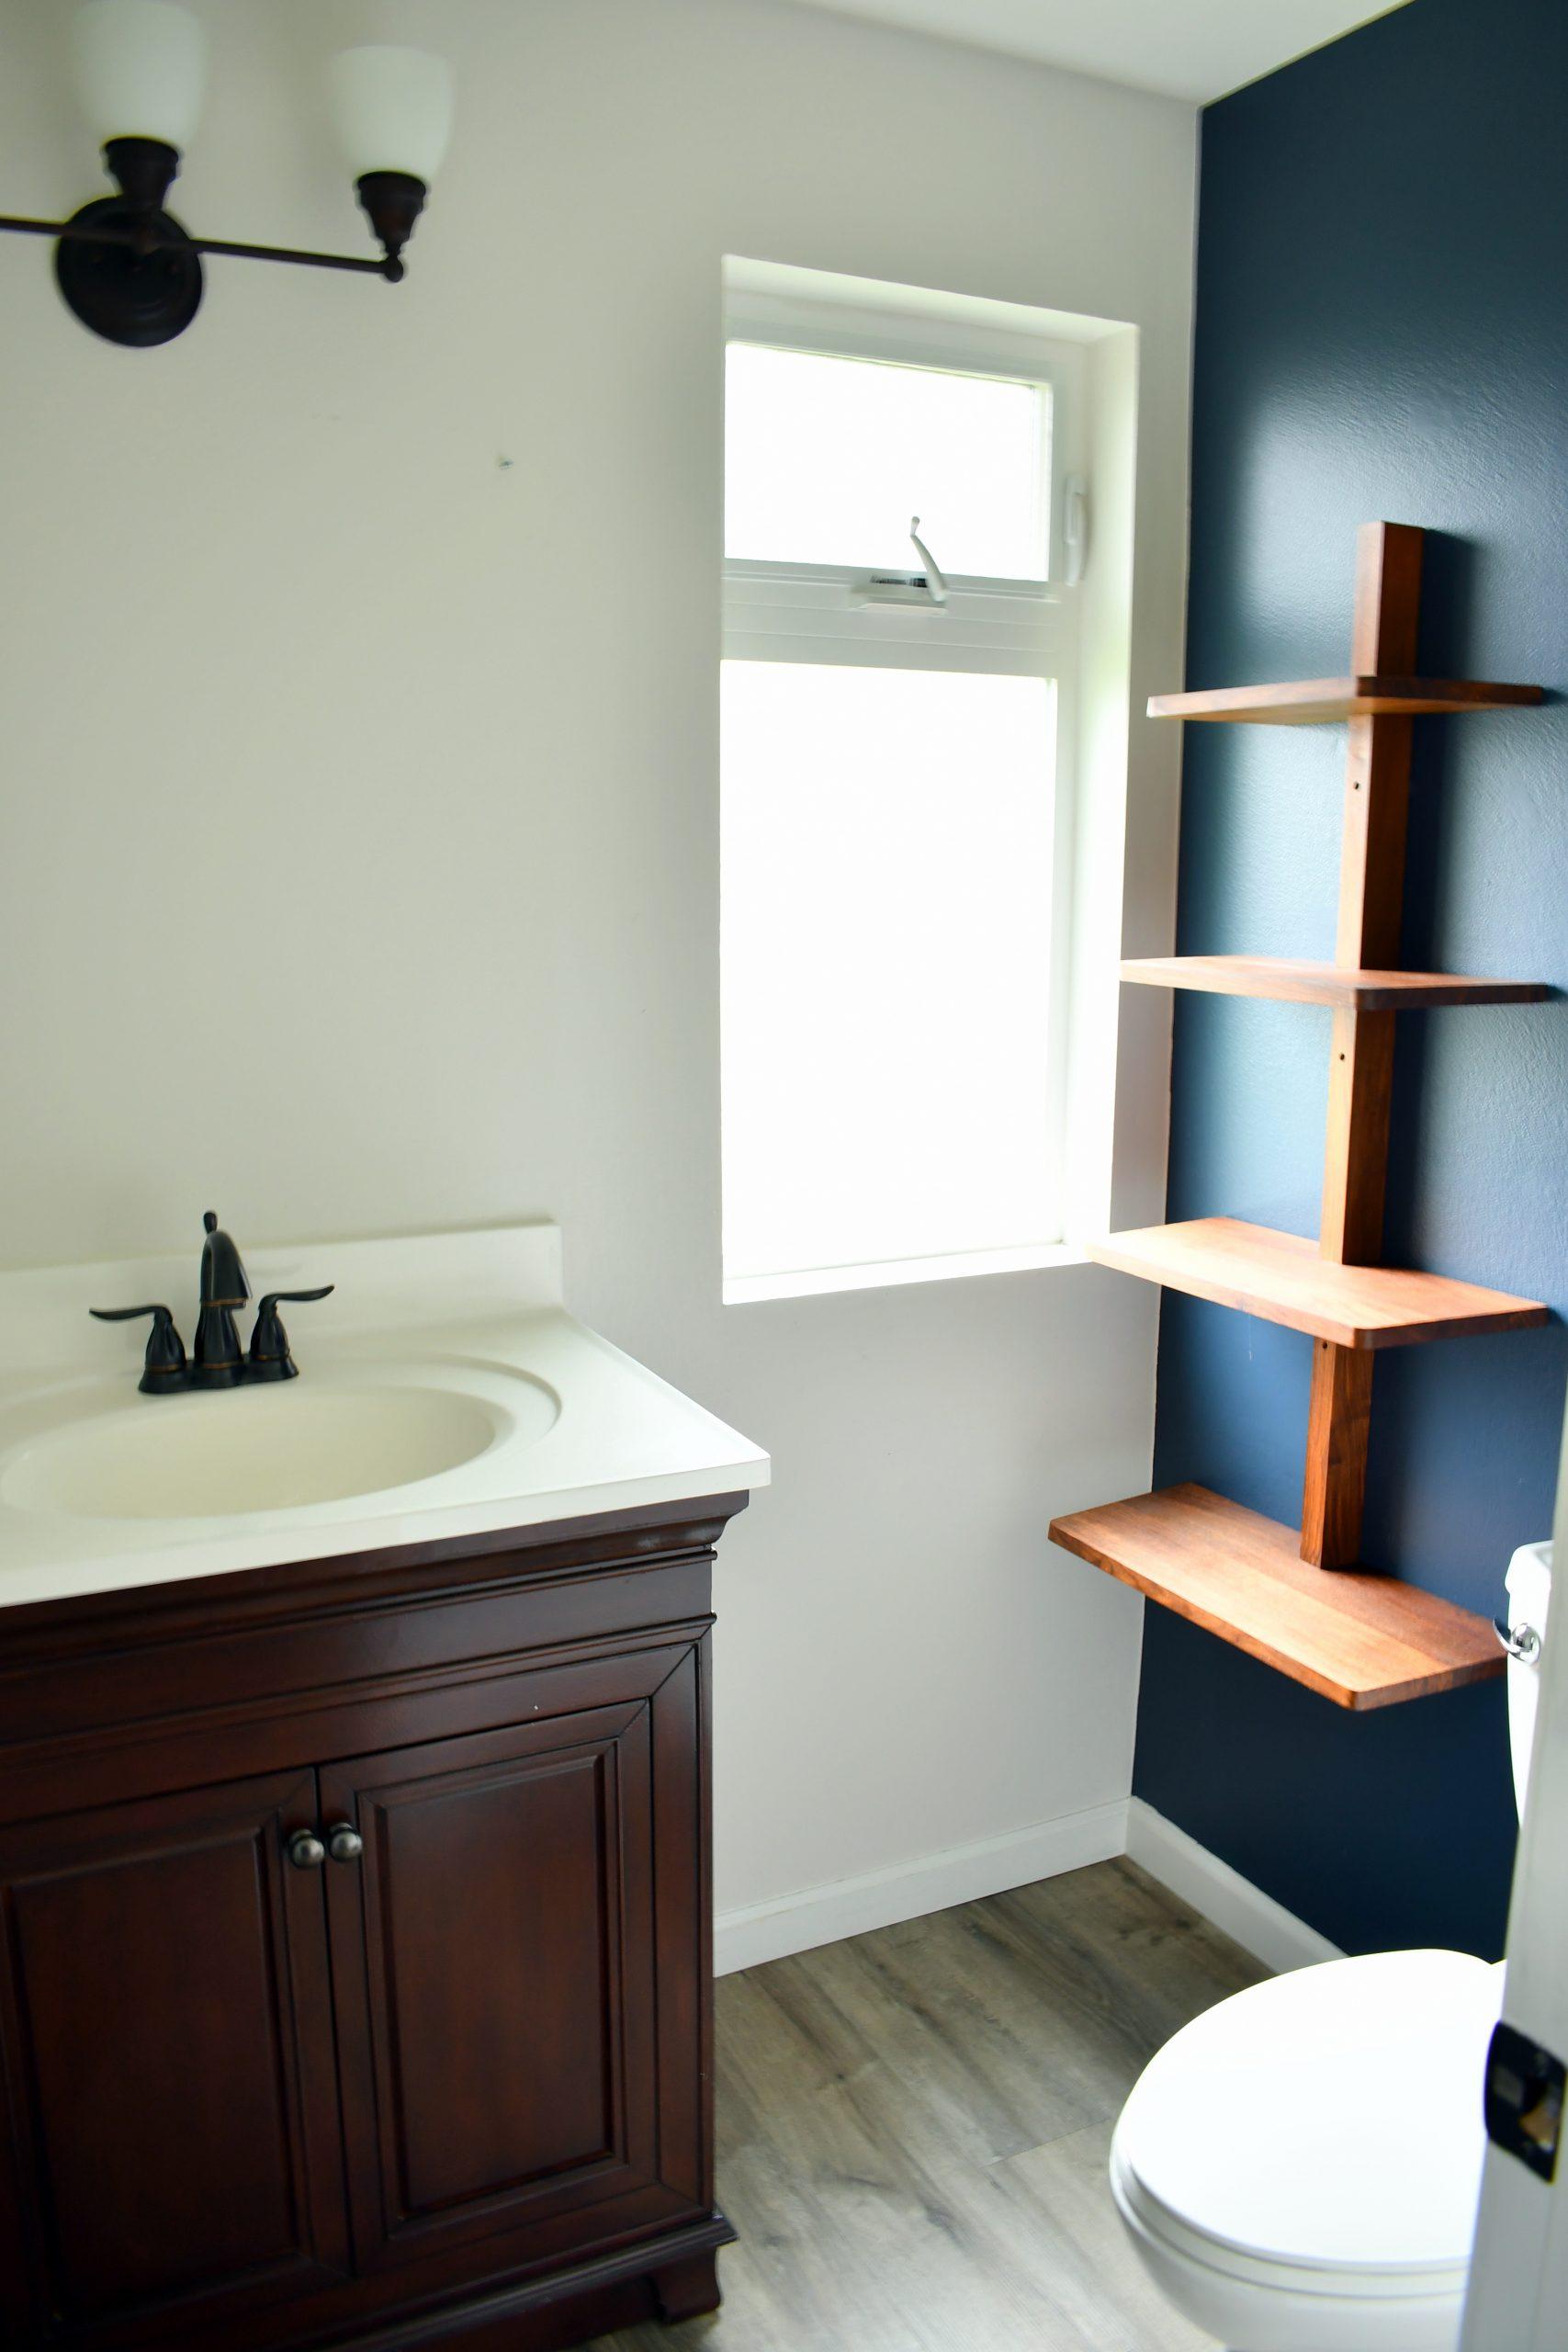 Powder room before shot of half-bath water closet